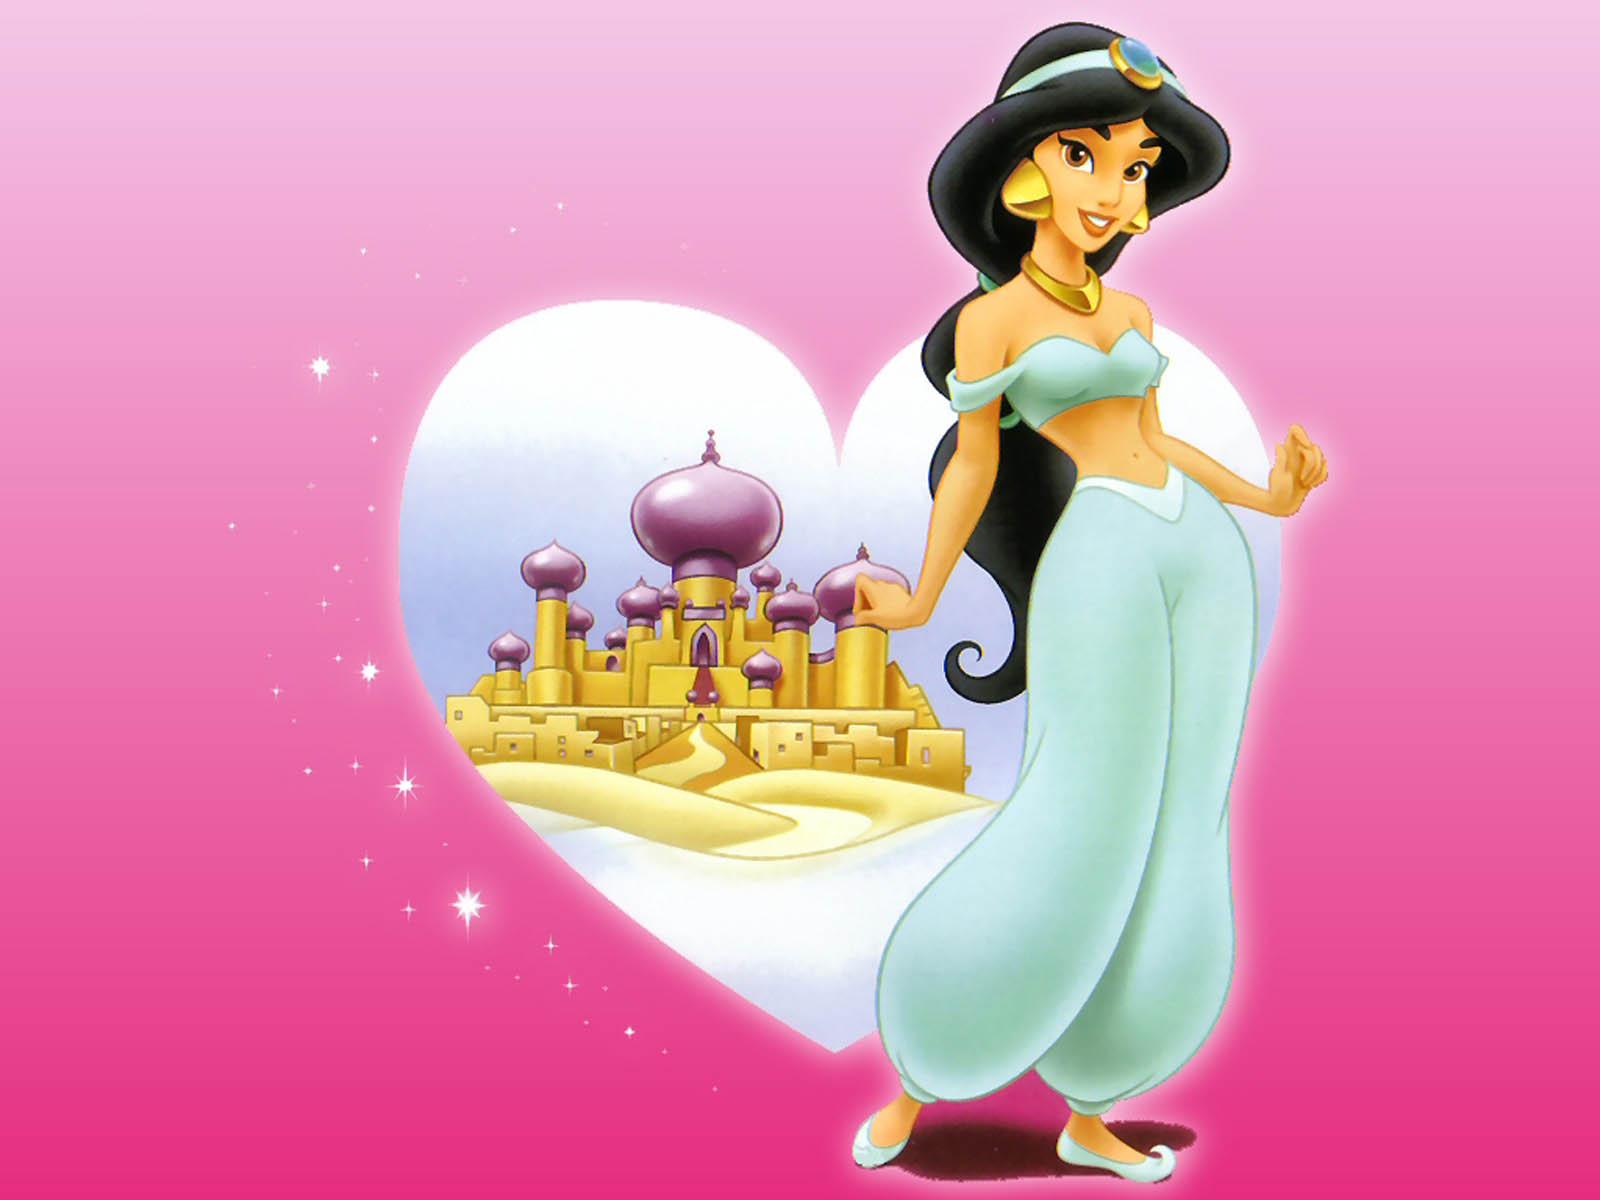 disney princess hot - photo #31